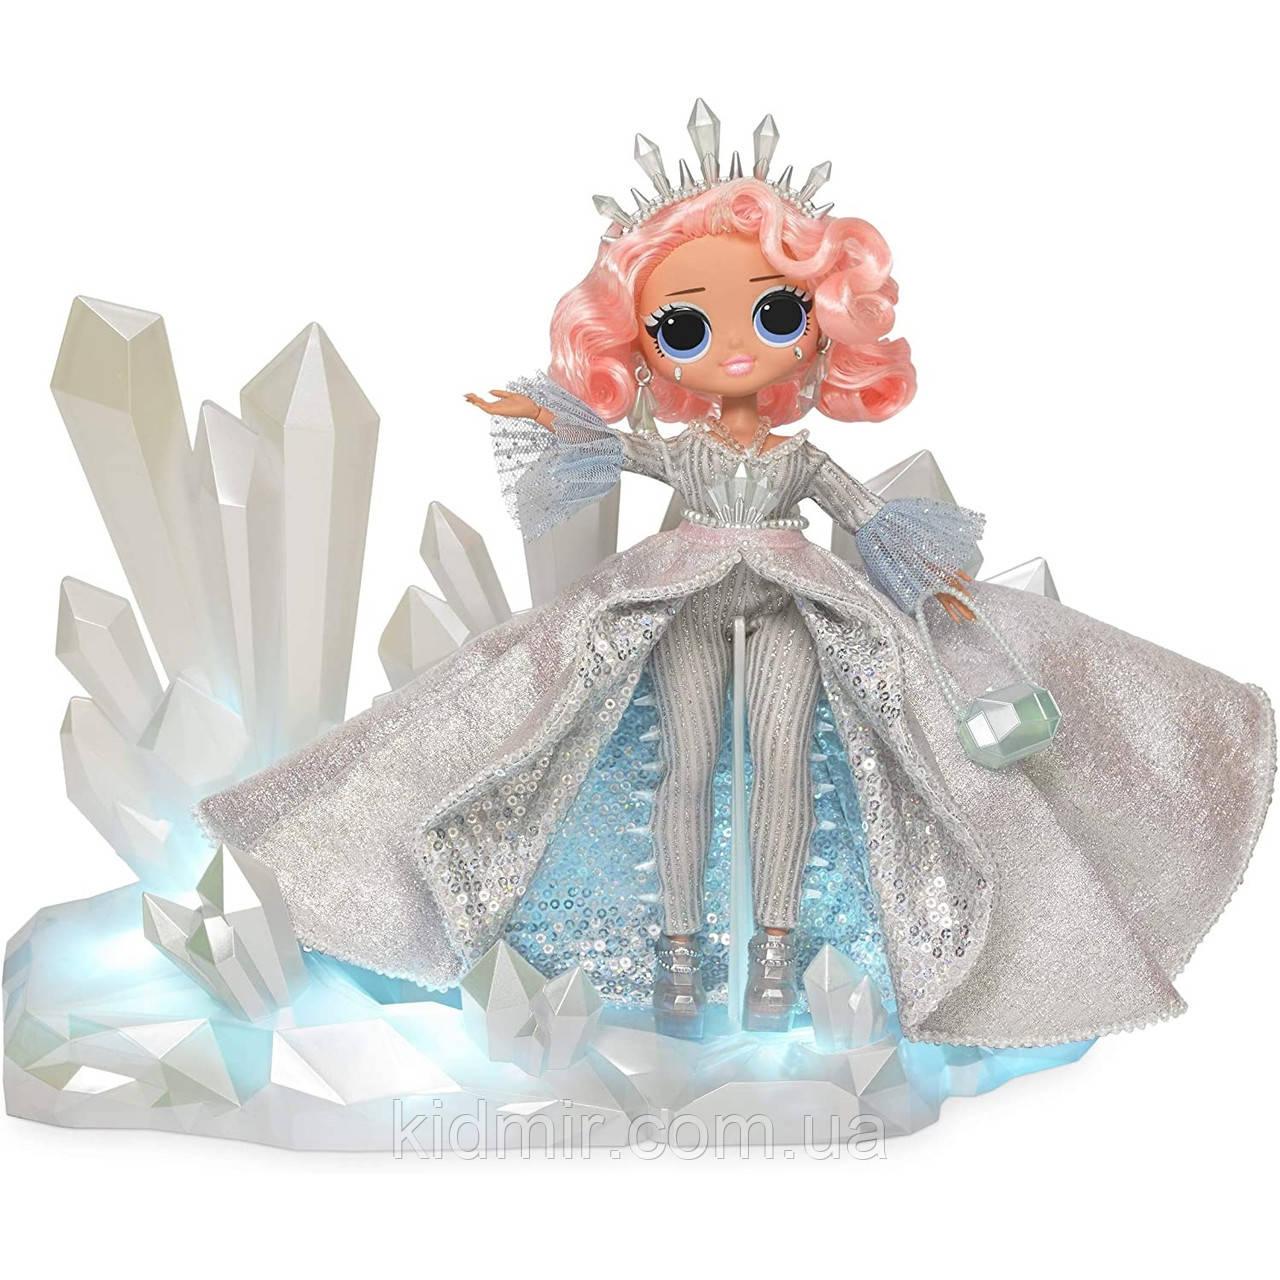 Лол Леді Кристал Стар L. O. L lol Surprise Crystal Star Winter Disco OMG 559795